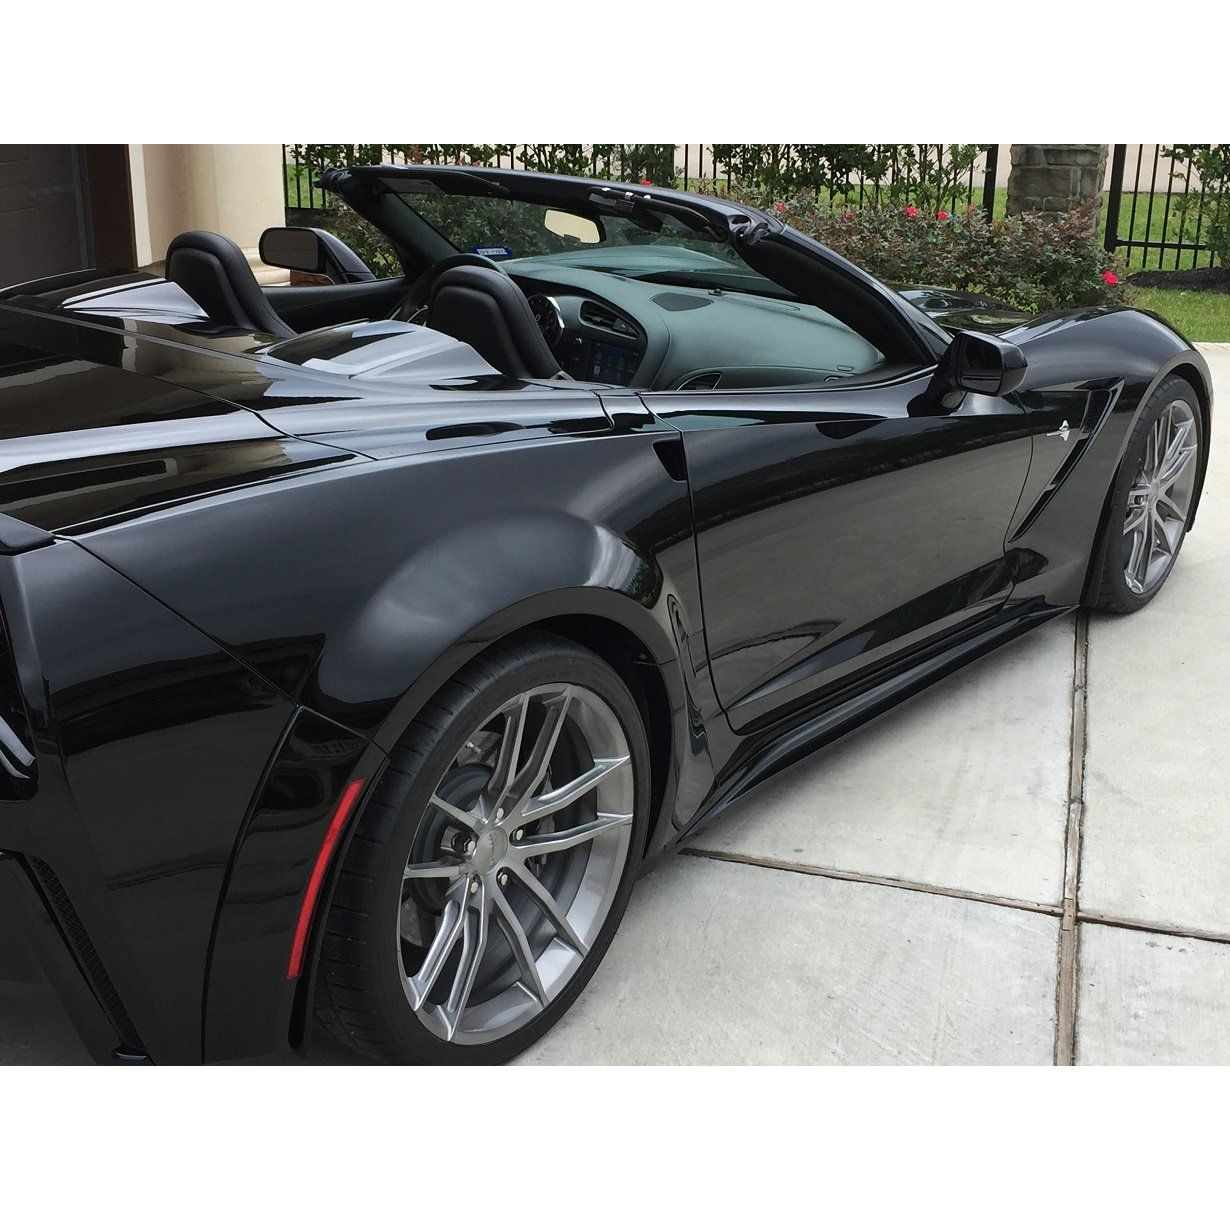 Corvette C7 Z06 Grand Sport Side Skirts Rocker Panels Abs Plastic Carbon Fiber Hydrographics Corvette C7 Carbon Fiber Corvette